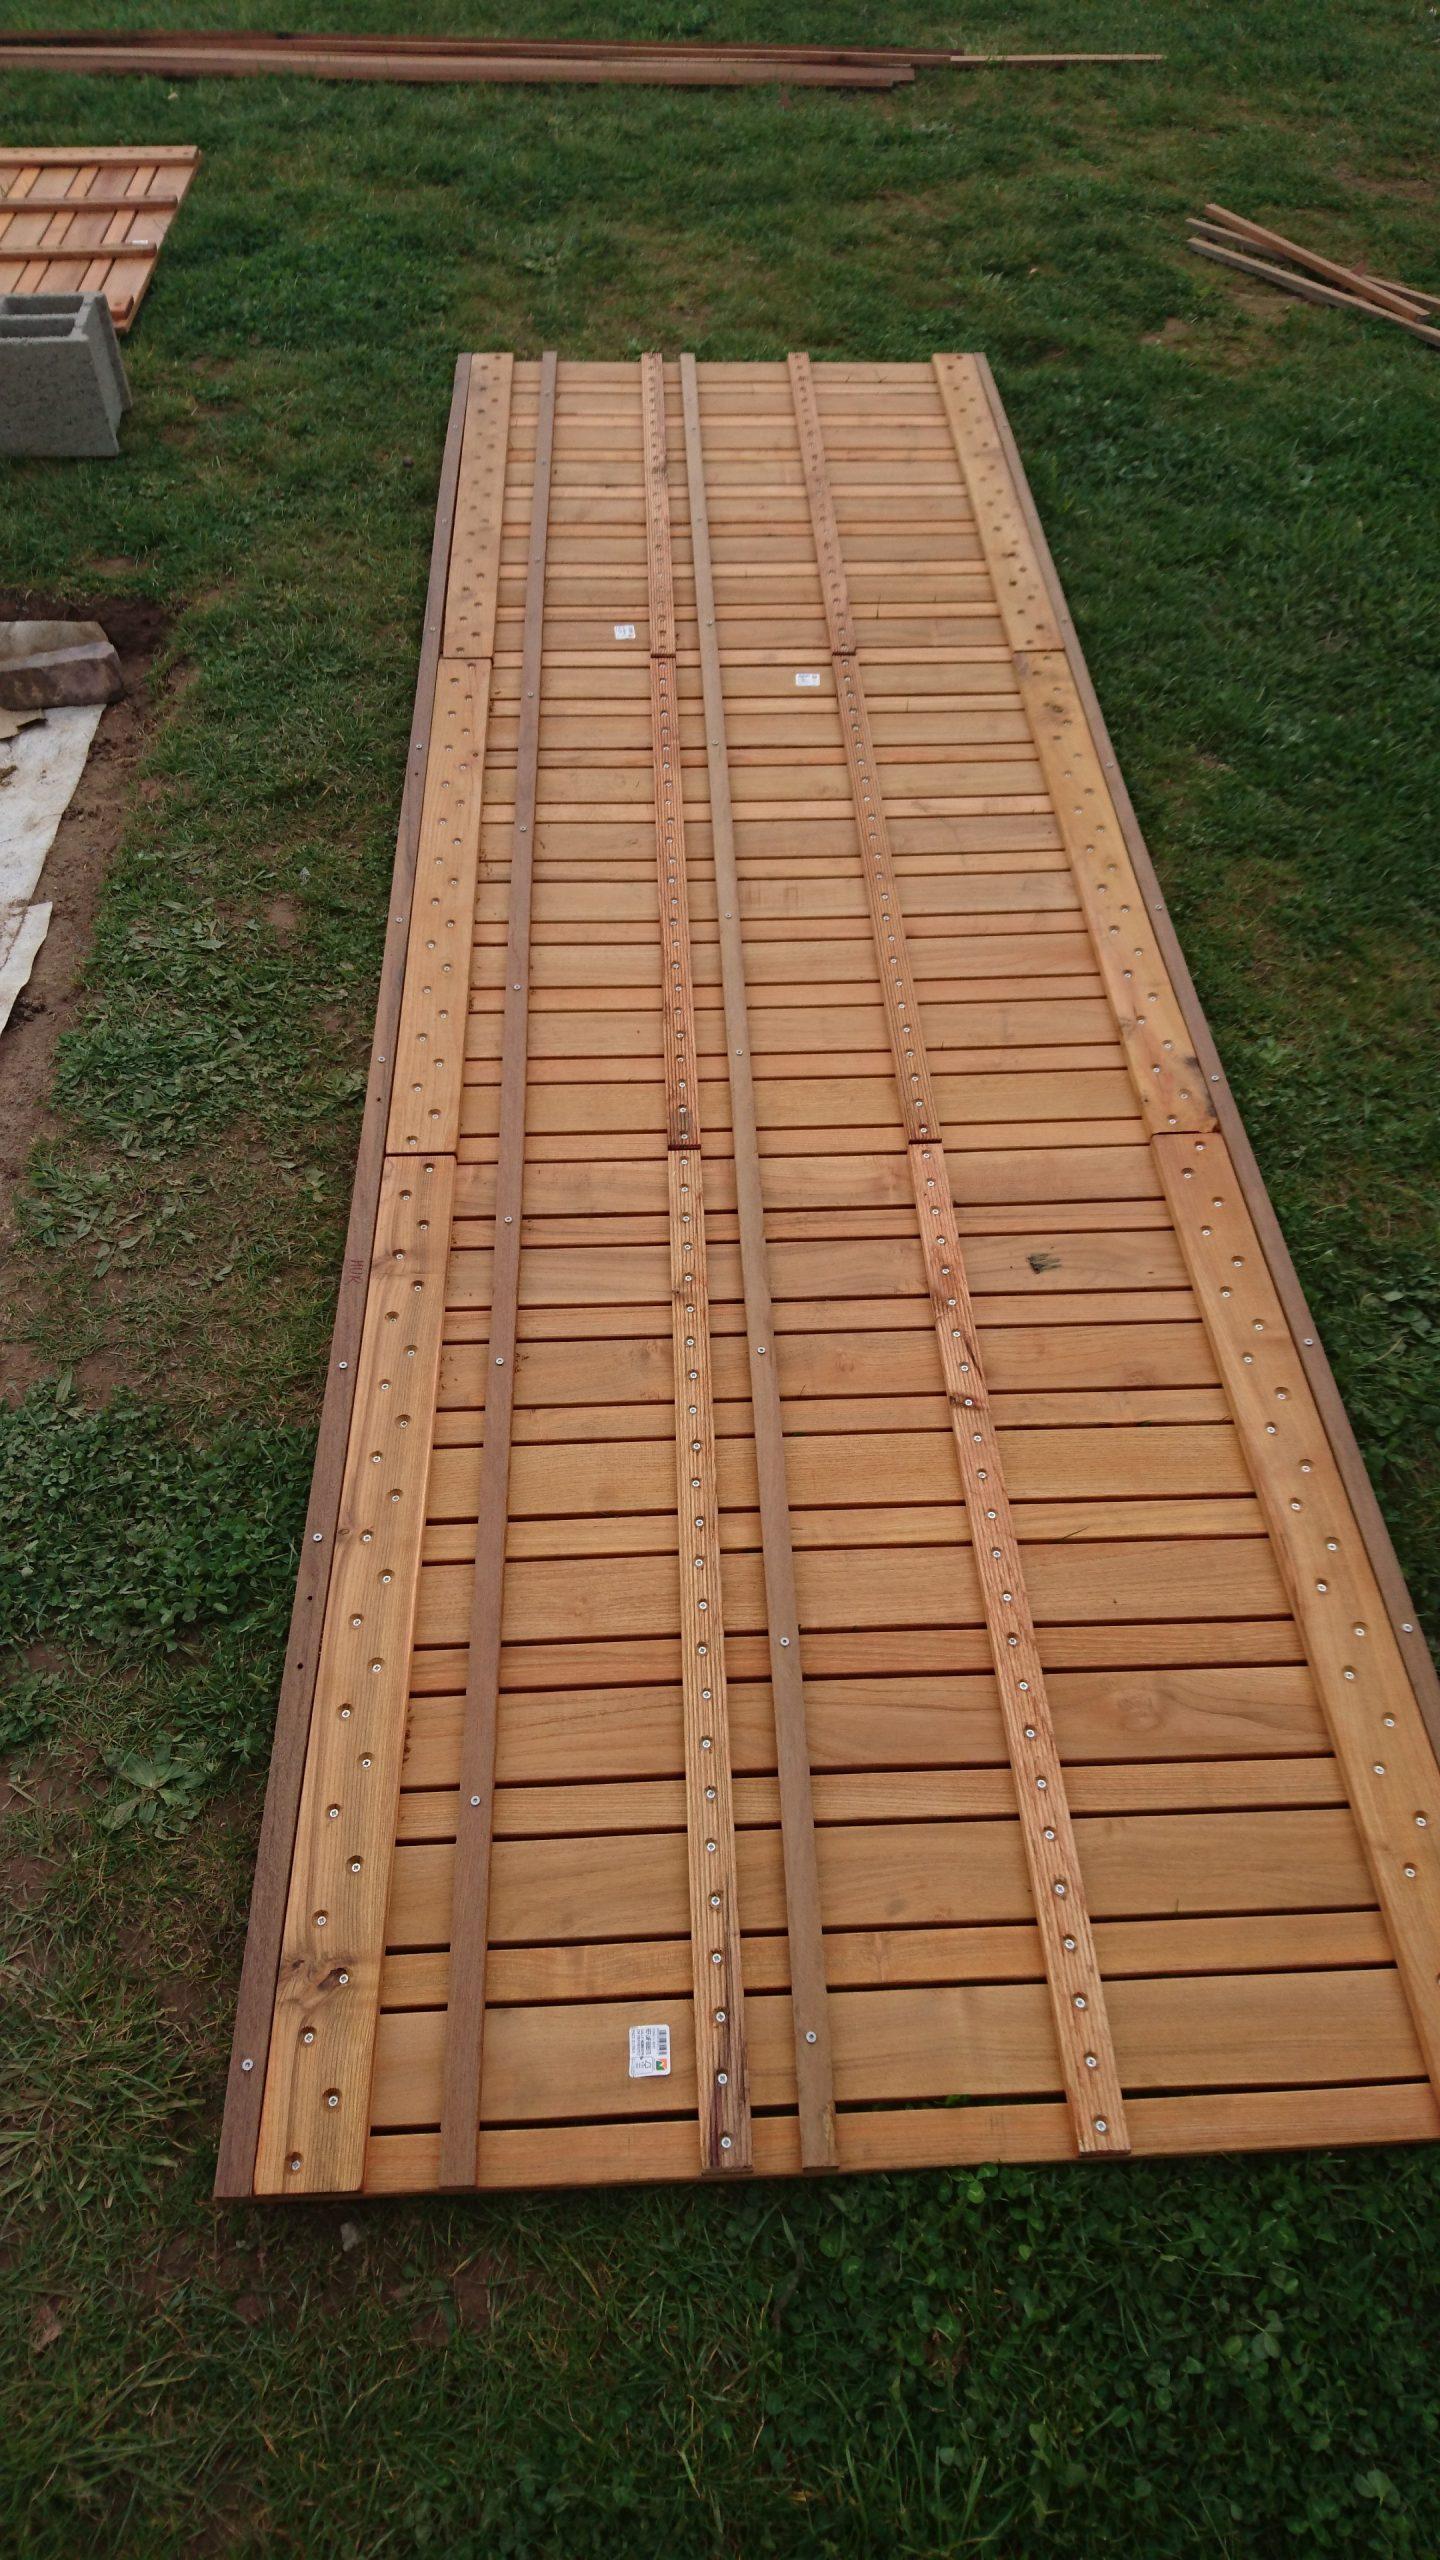 Construire Sa Terrasse Sur De La Terre Meuble - Construction ... avec Caillebotis 100X100 Castorama